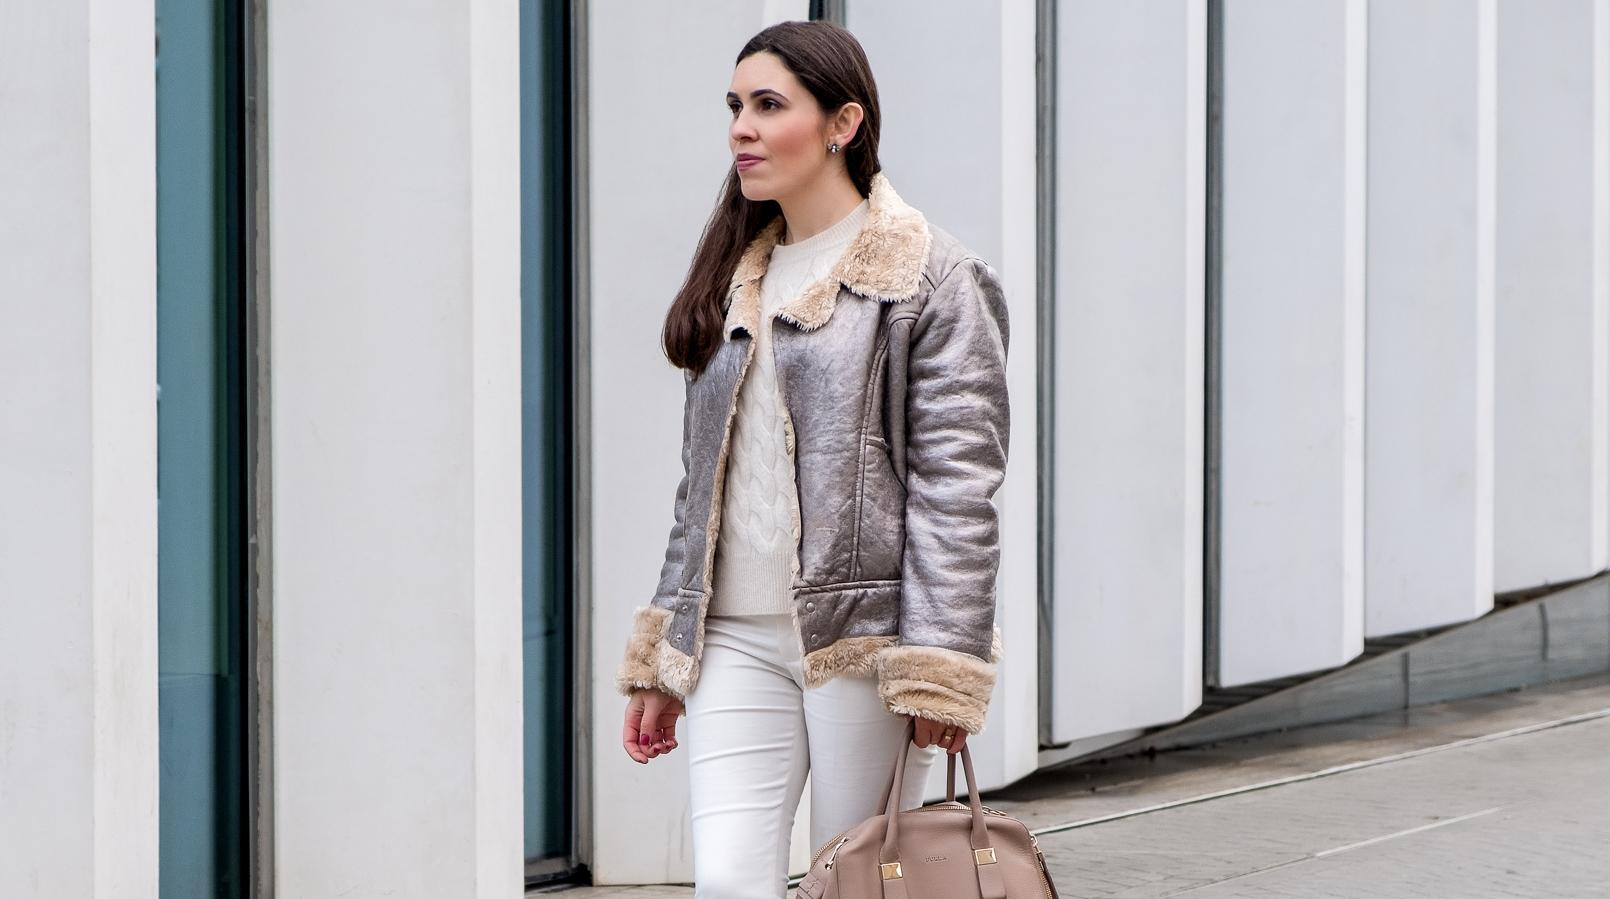 Le Fashionaire Somos demasiado influenciados pelo instagram? camisola oitos bege caxemira mango calcas brancas zara 5404F PT